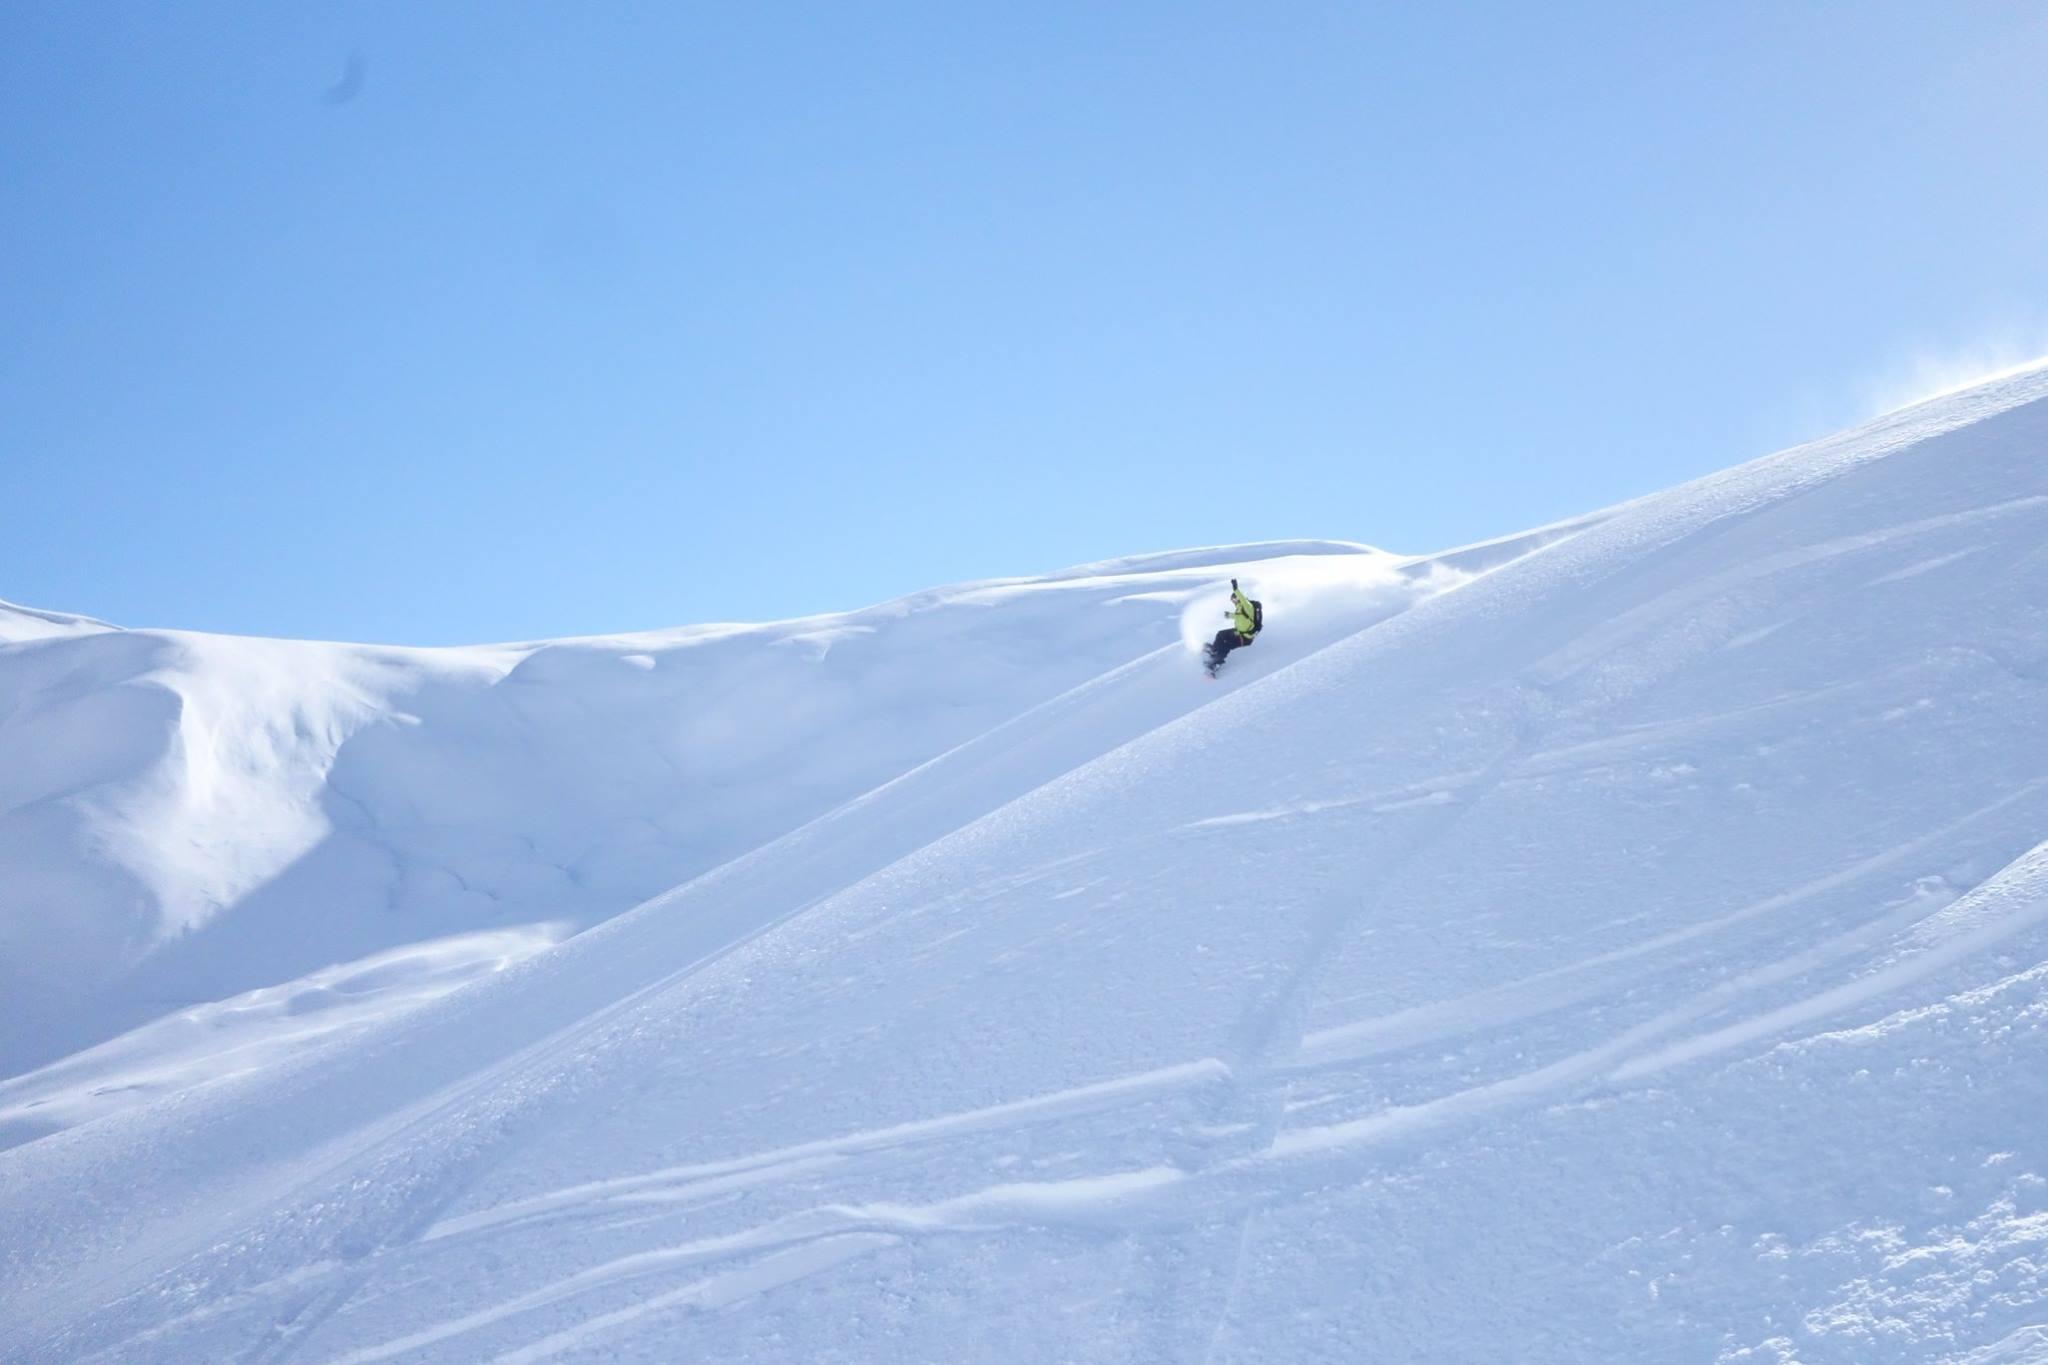 Pure Snow TJ Snowboarding in Alaska 1.jpg